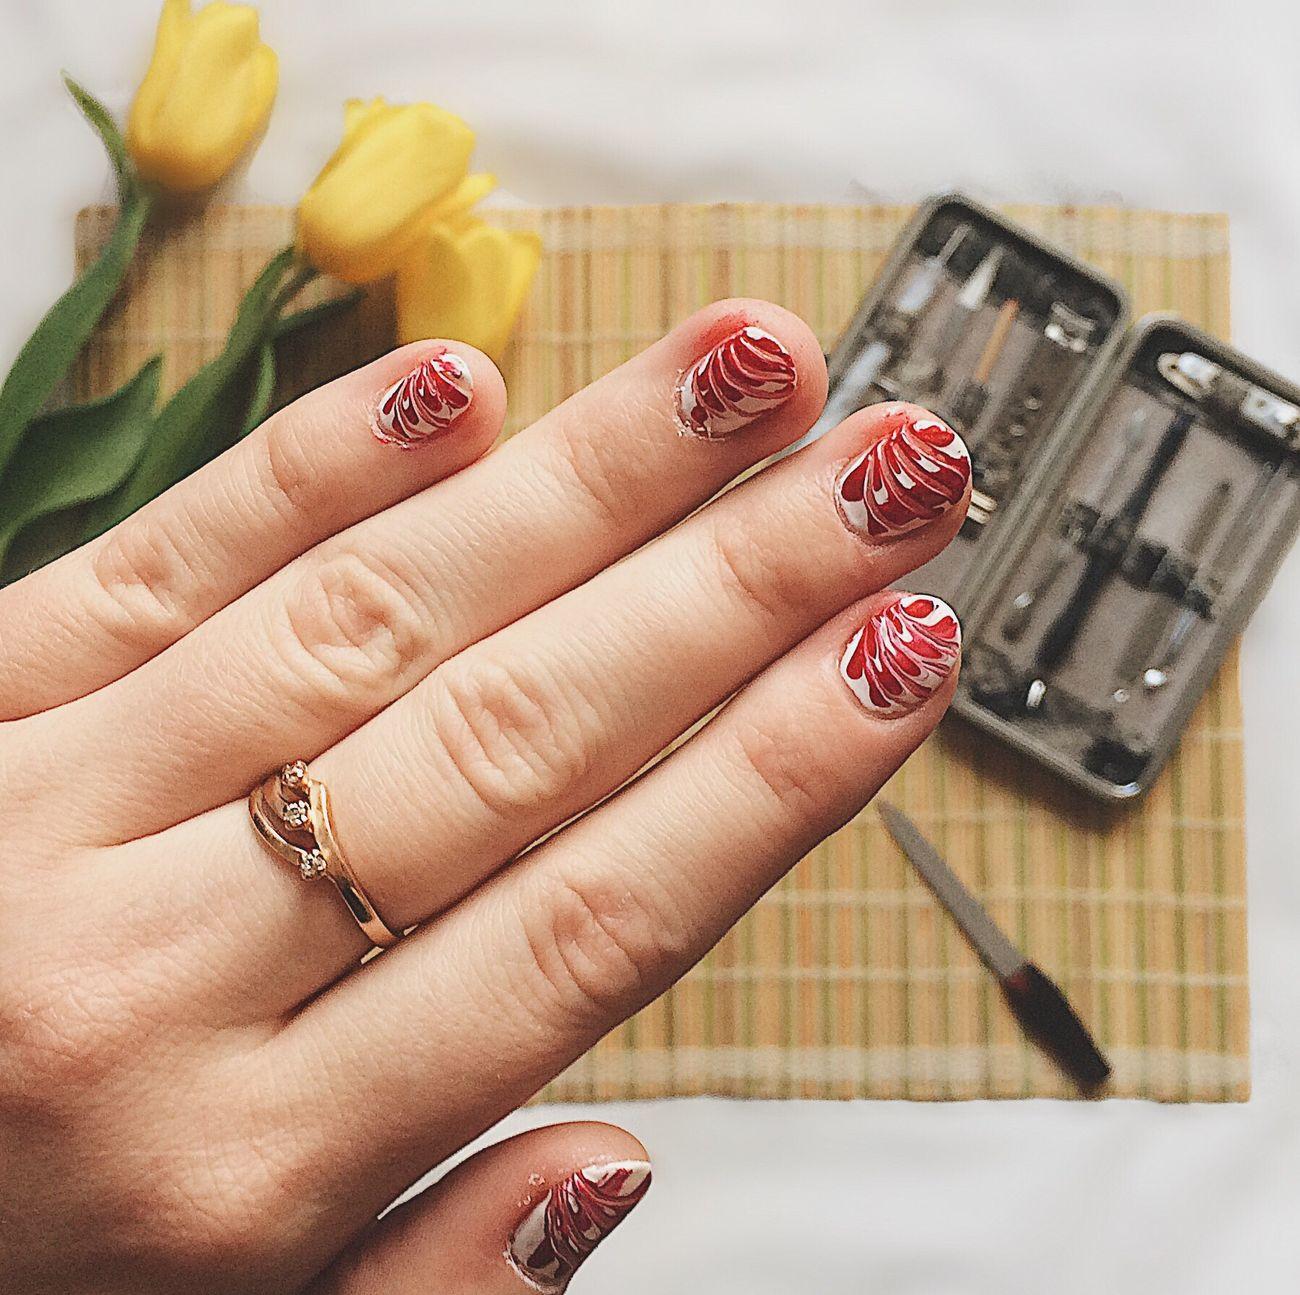 Manicure! Hand